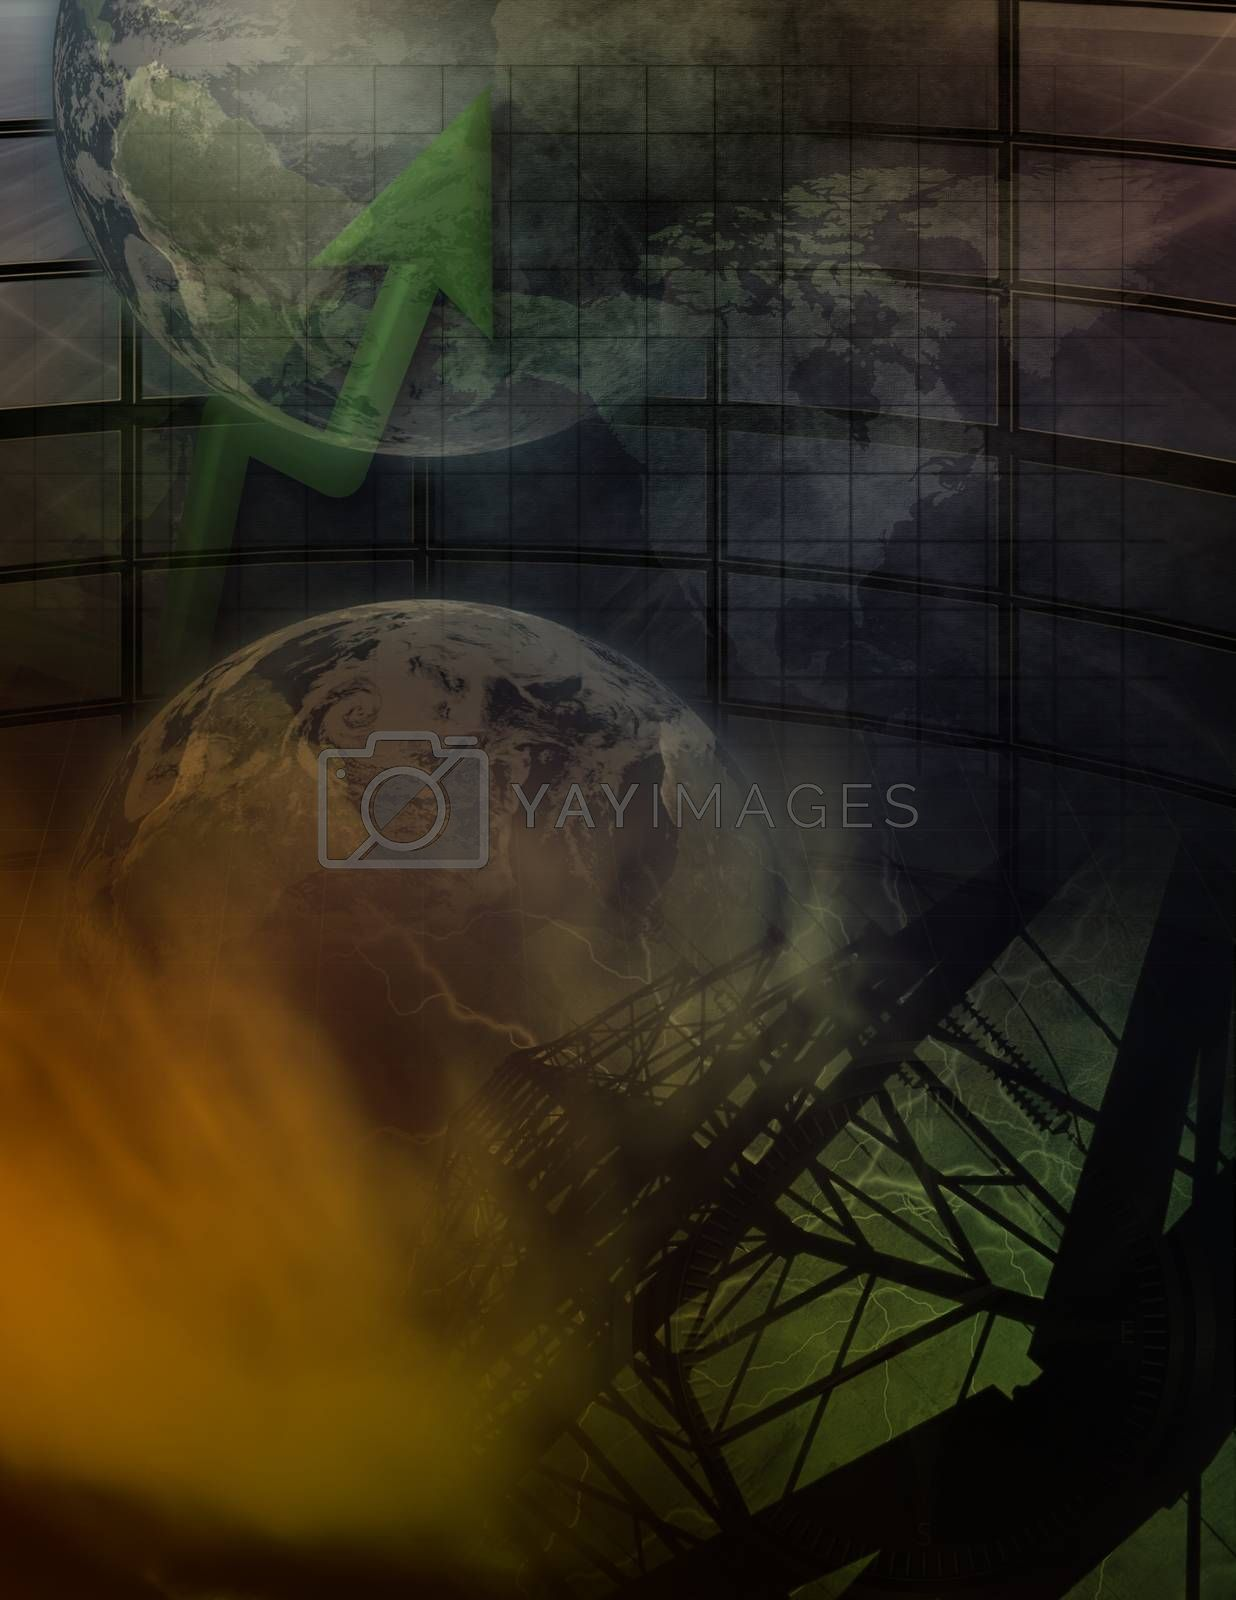 High voltage pillar, chart and globe.